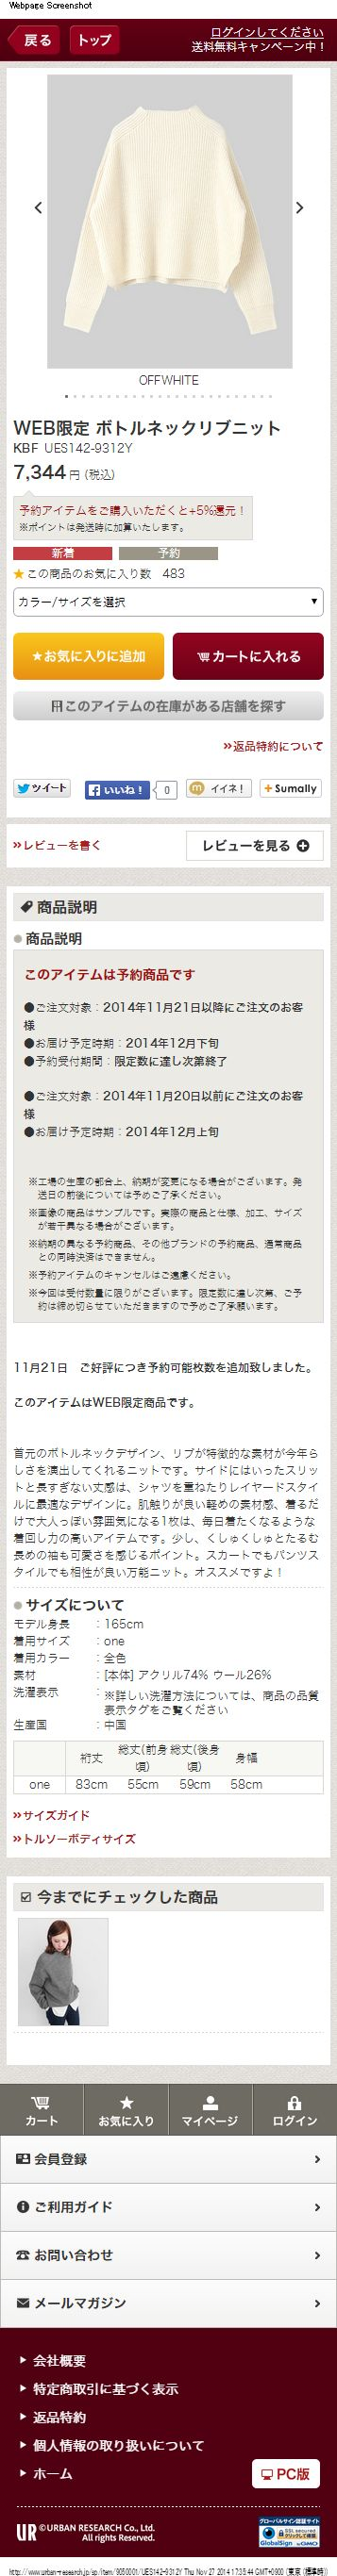 WEB限定 ボトルネックリブニット - URBAN RESEARCH ONLINE STORE